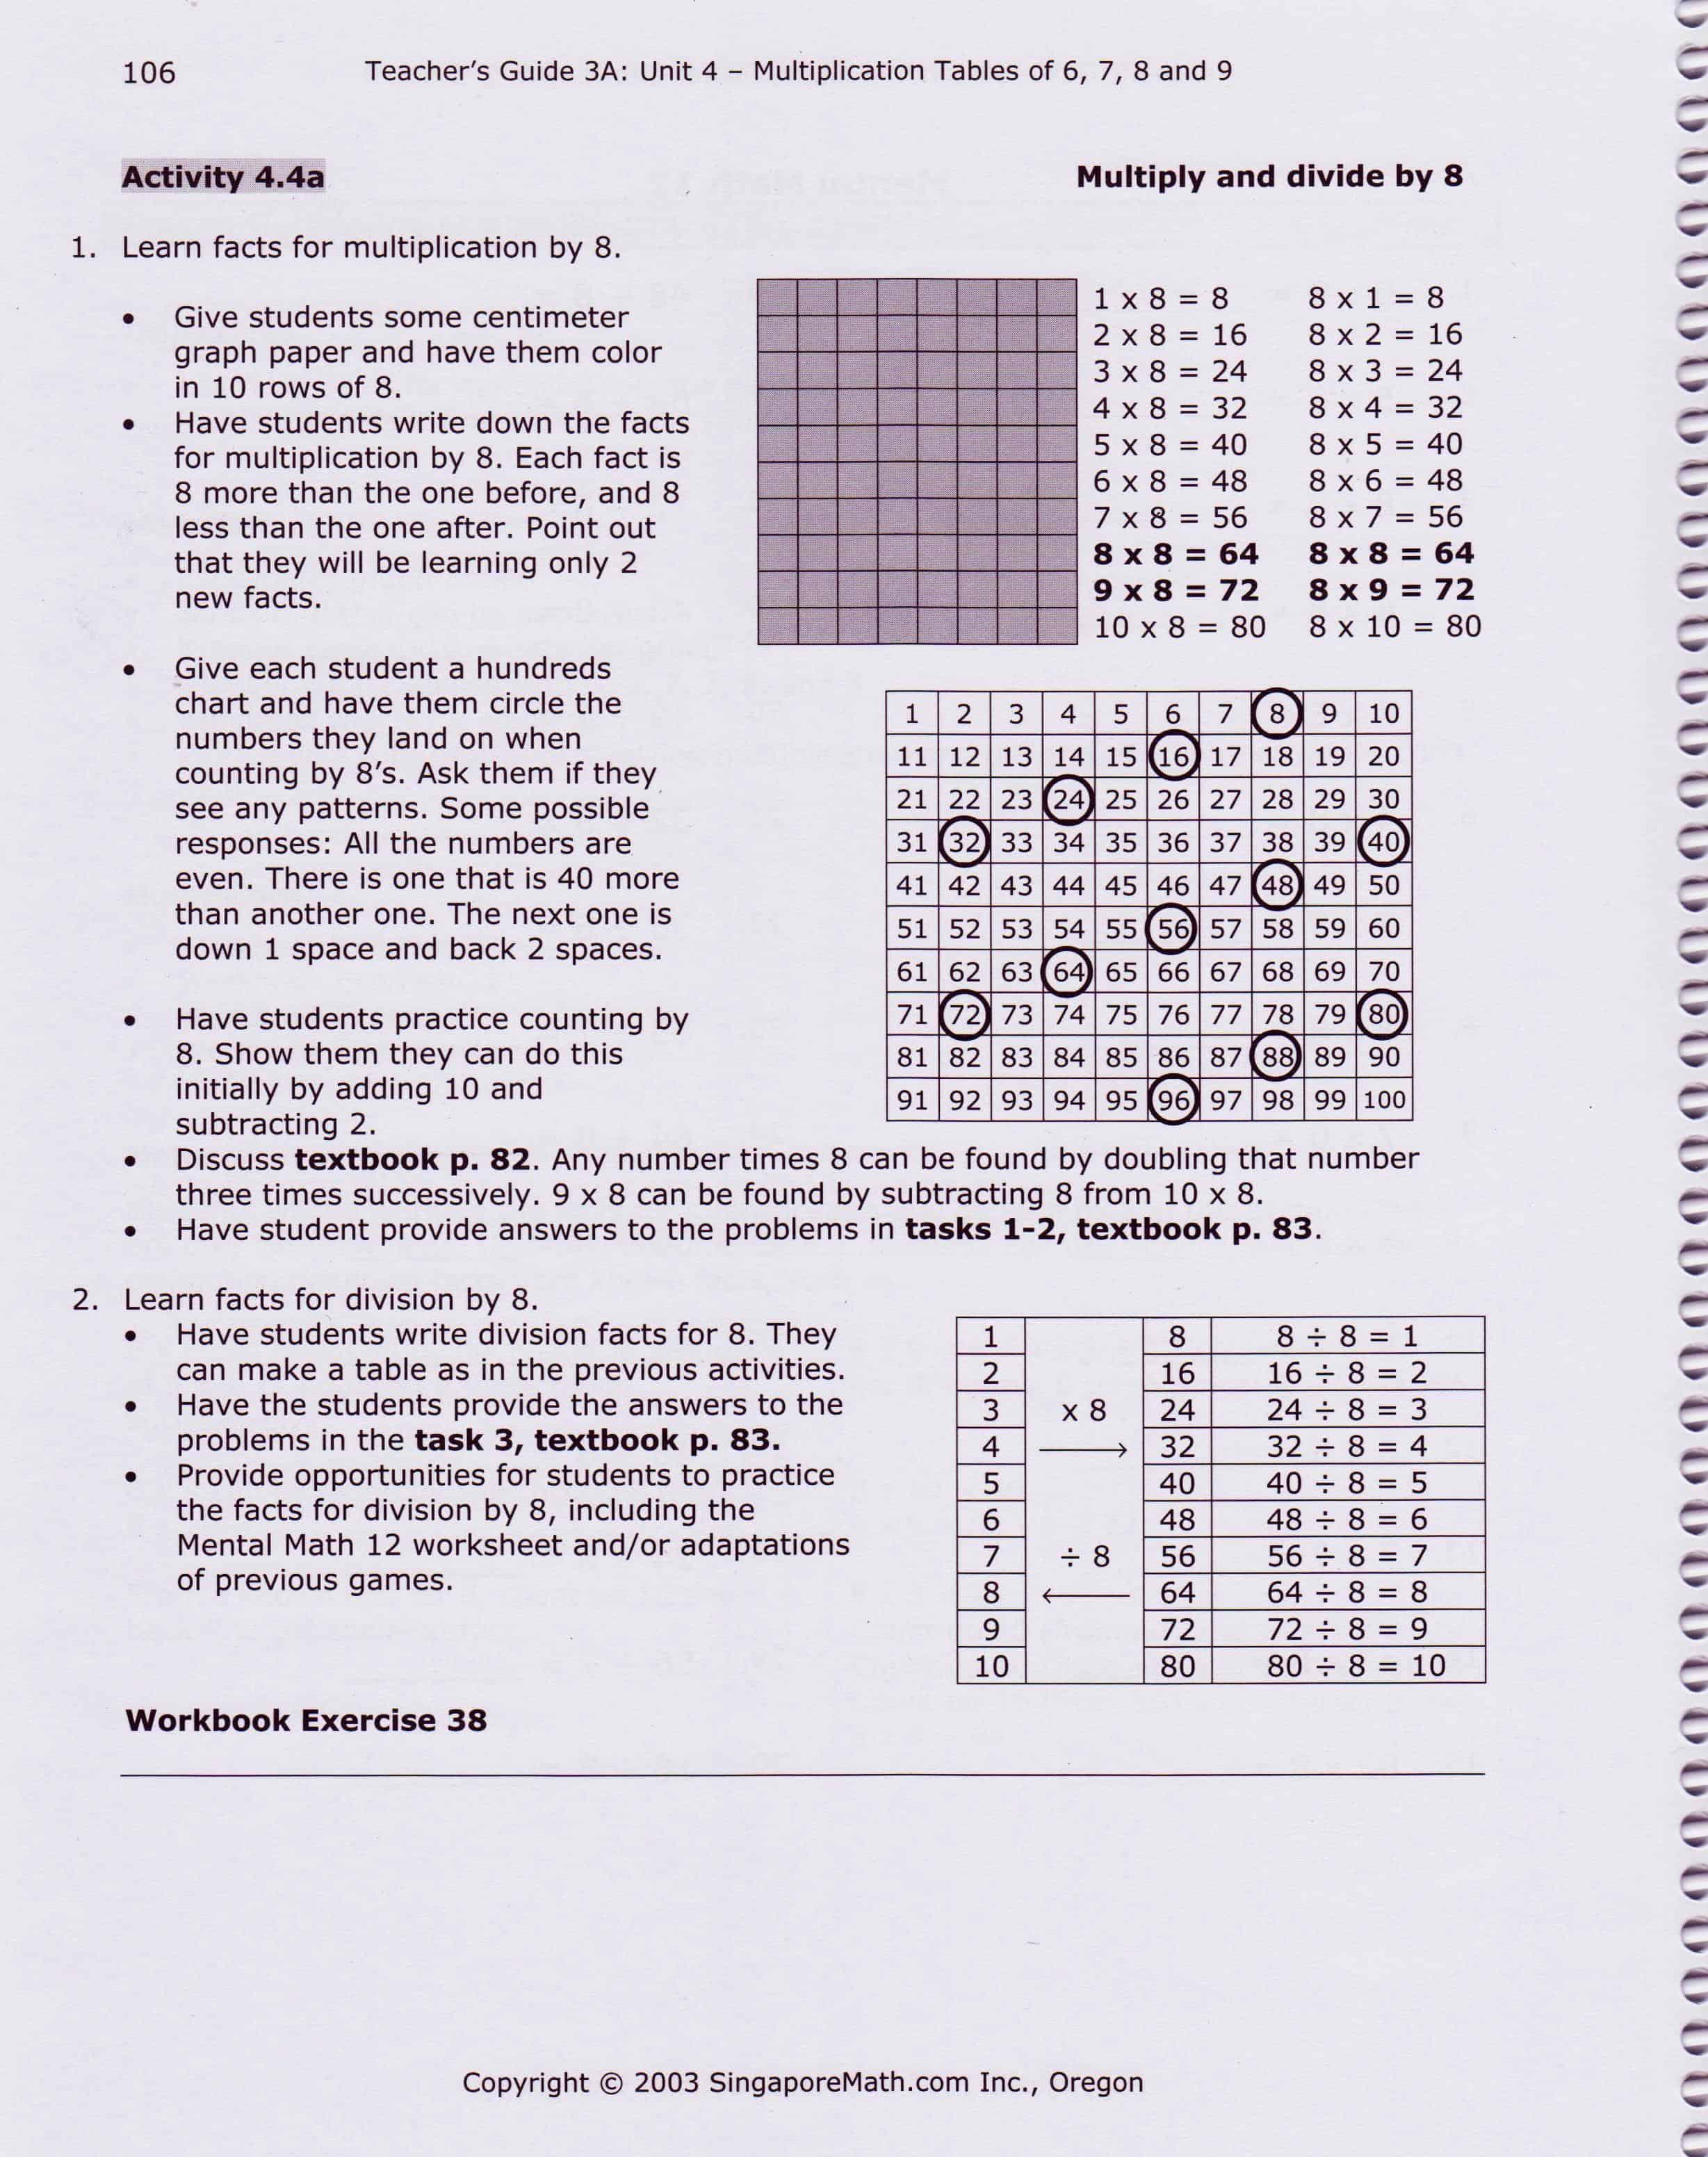 Singapore Math curriculum | SingaporeMathSource - Part 7 on